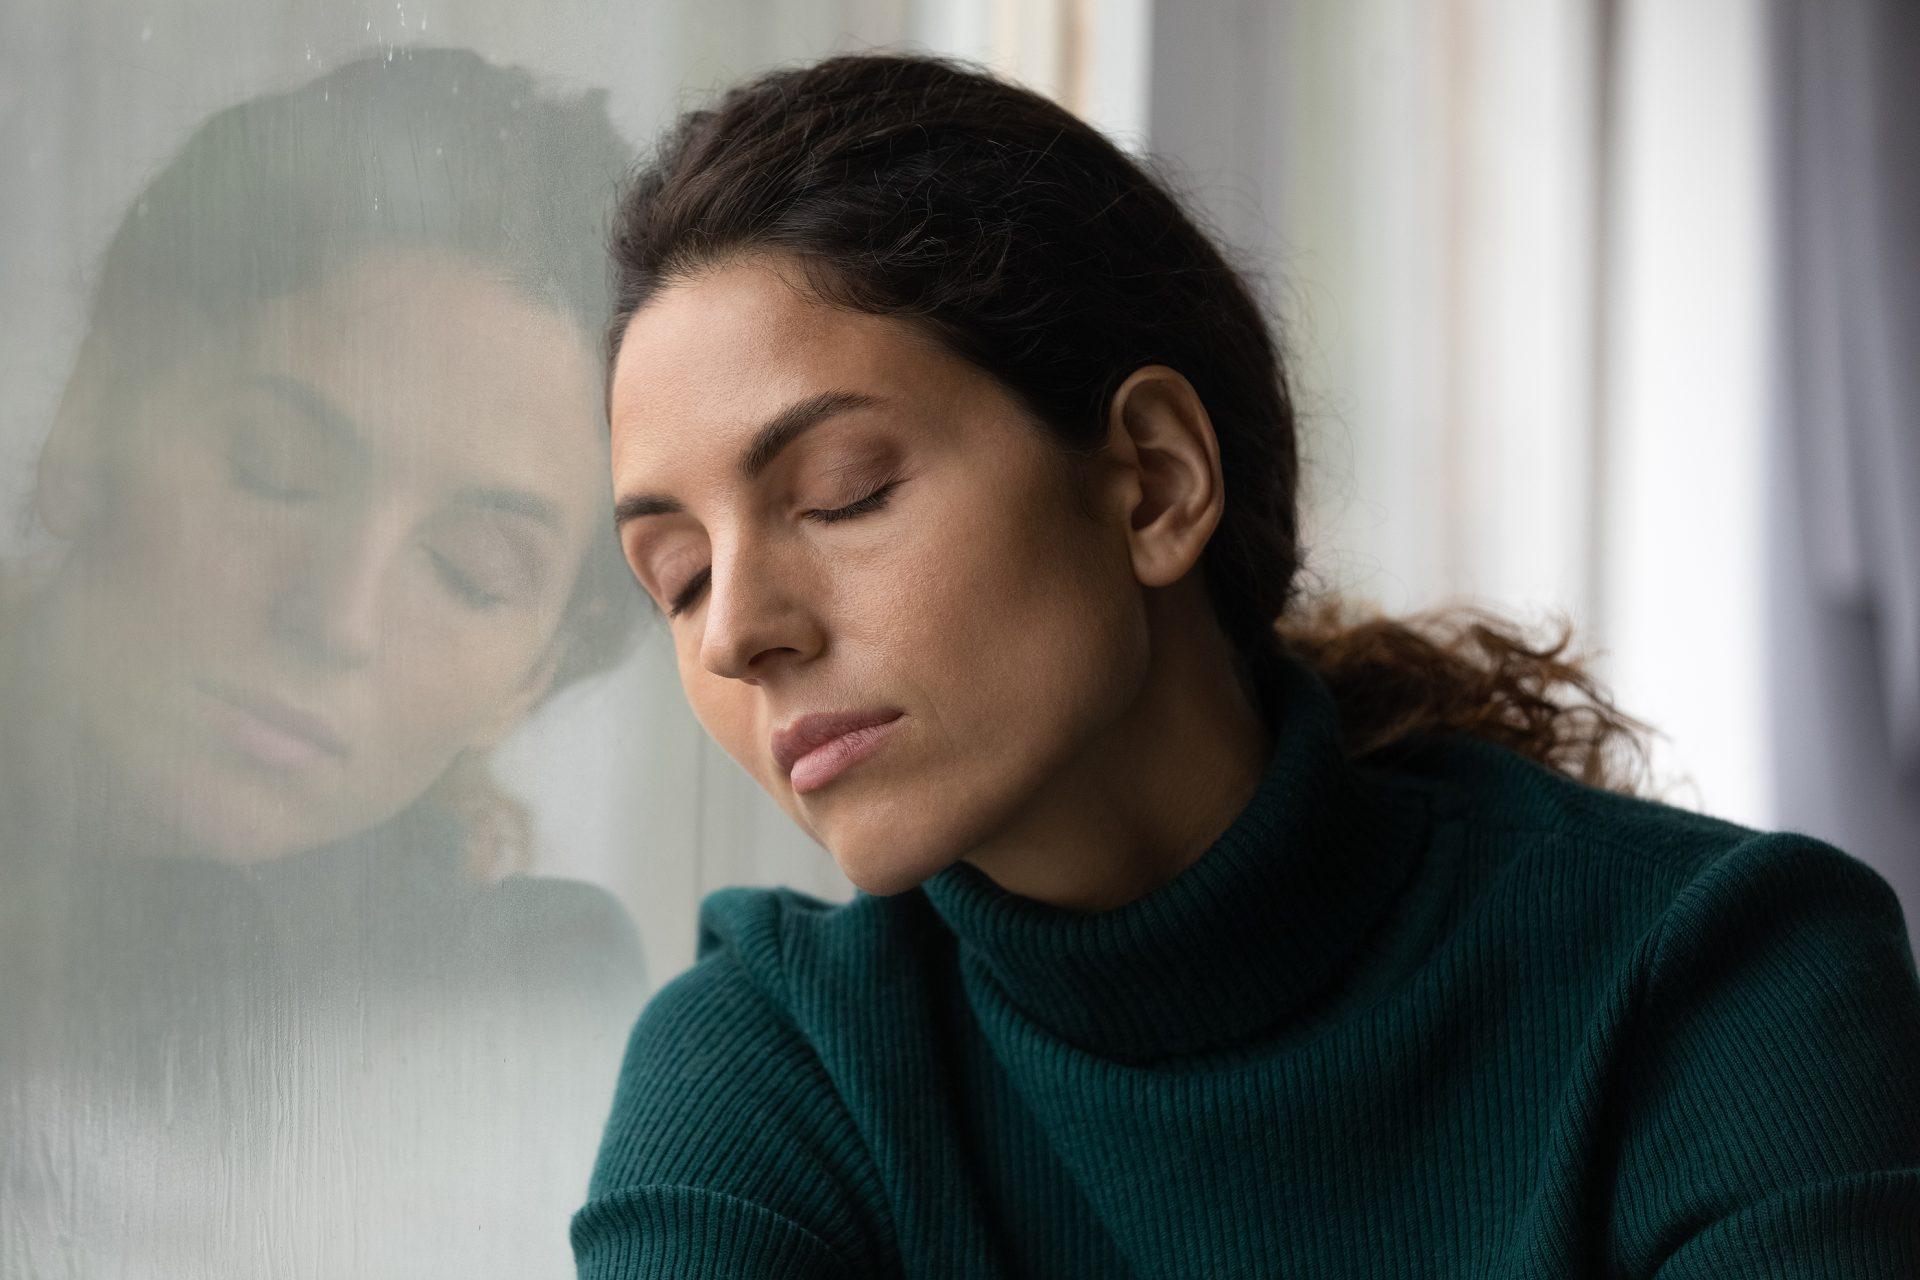 How Childhood Trauma Affects Mental Health and Wellness